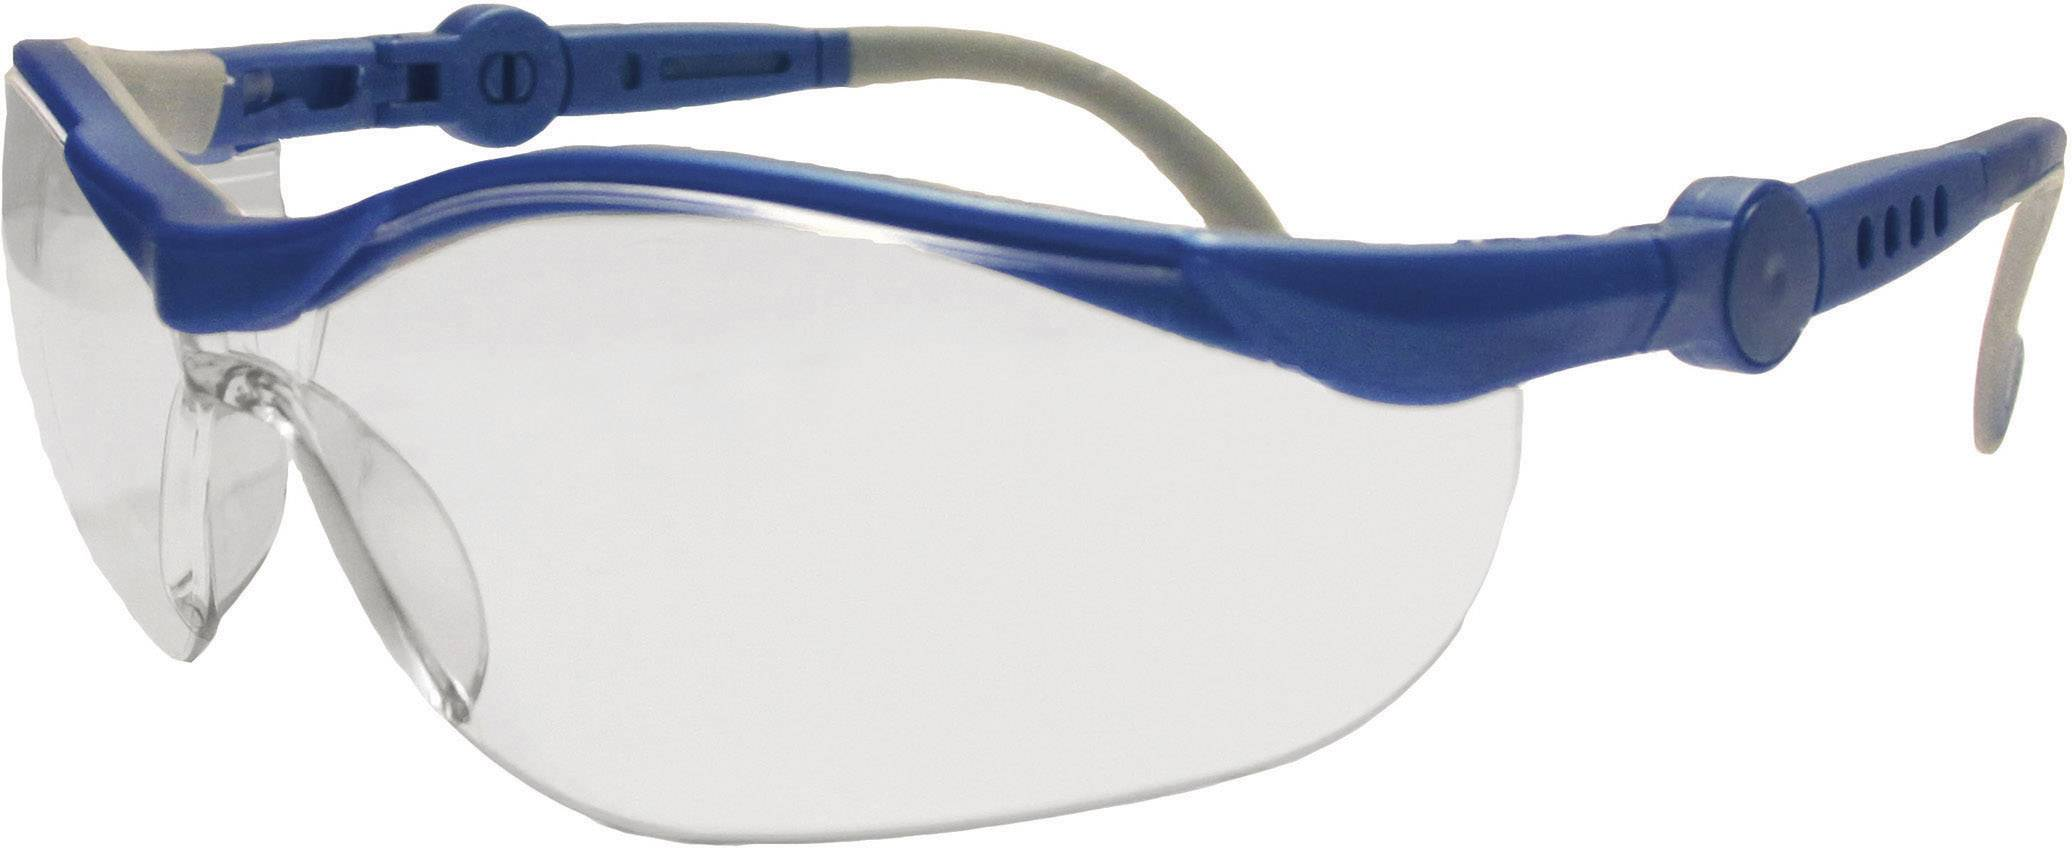 Ochranné okuliare Upixx Cycle Panorama, číre